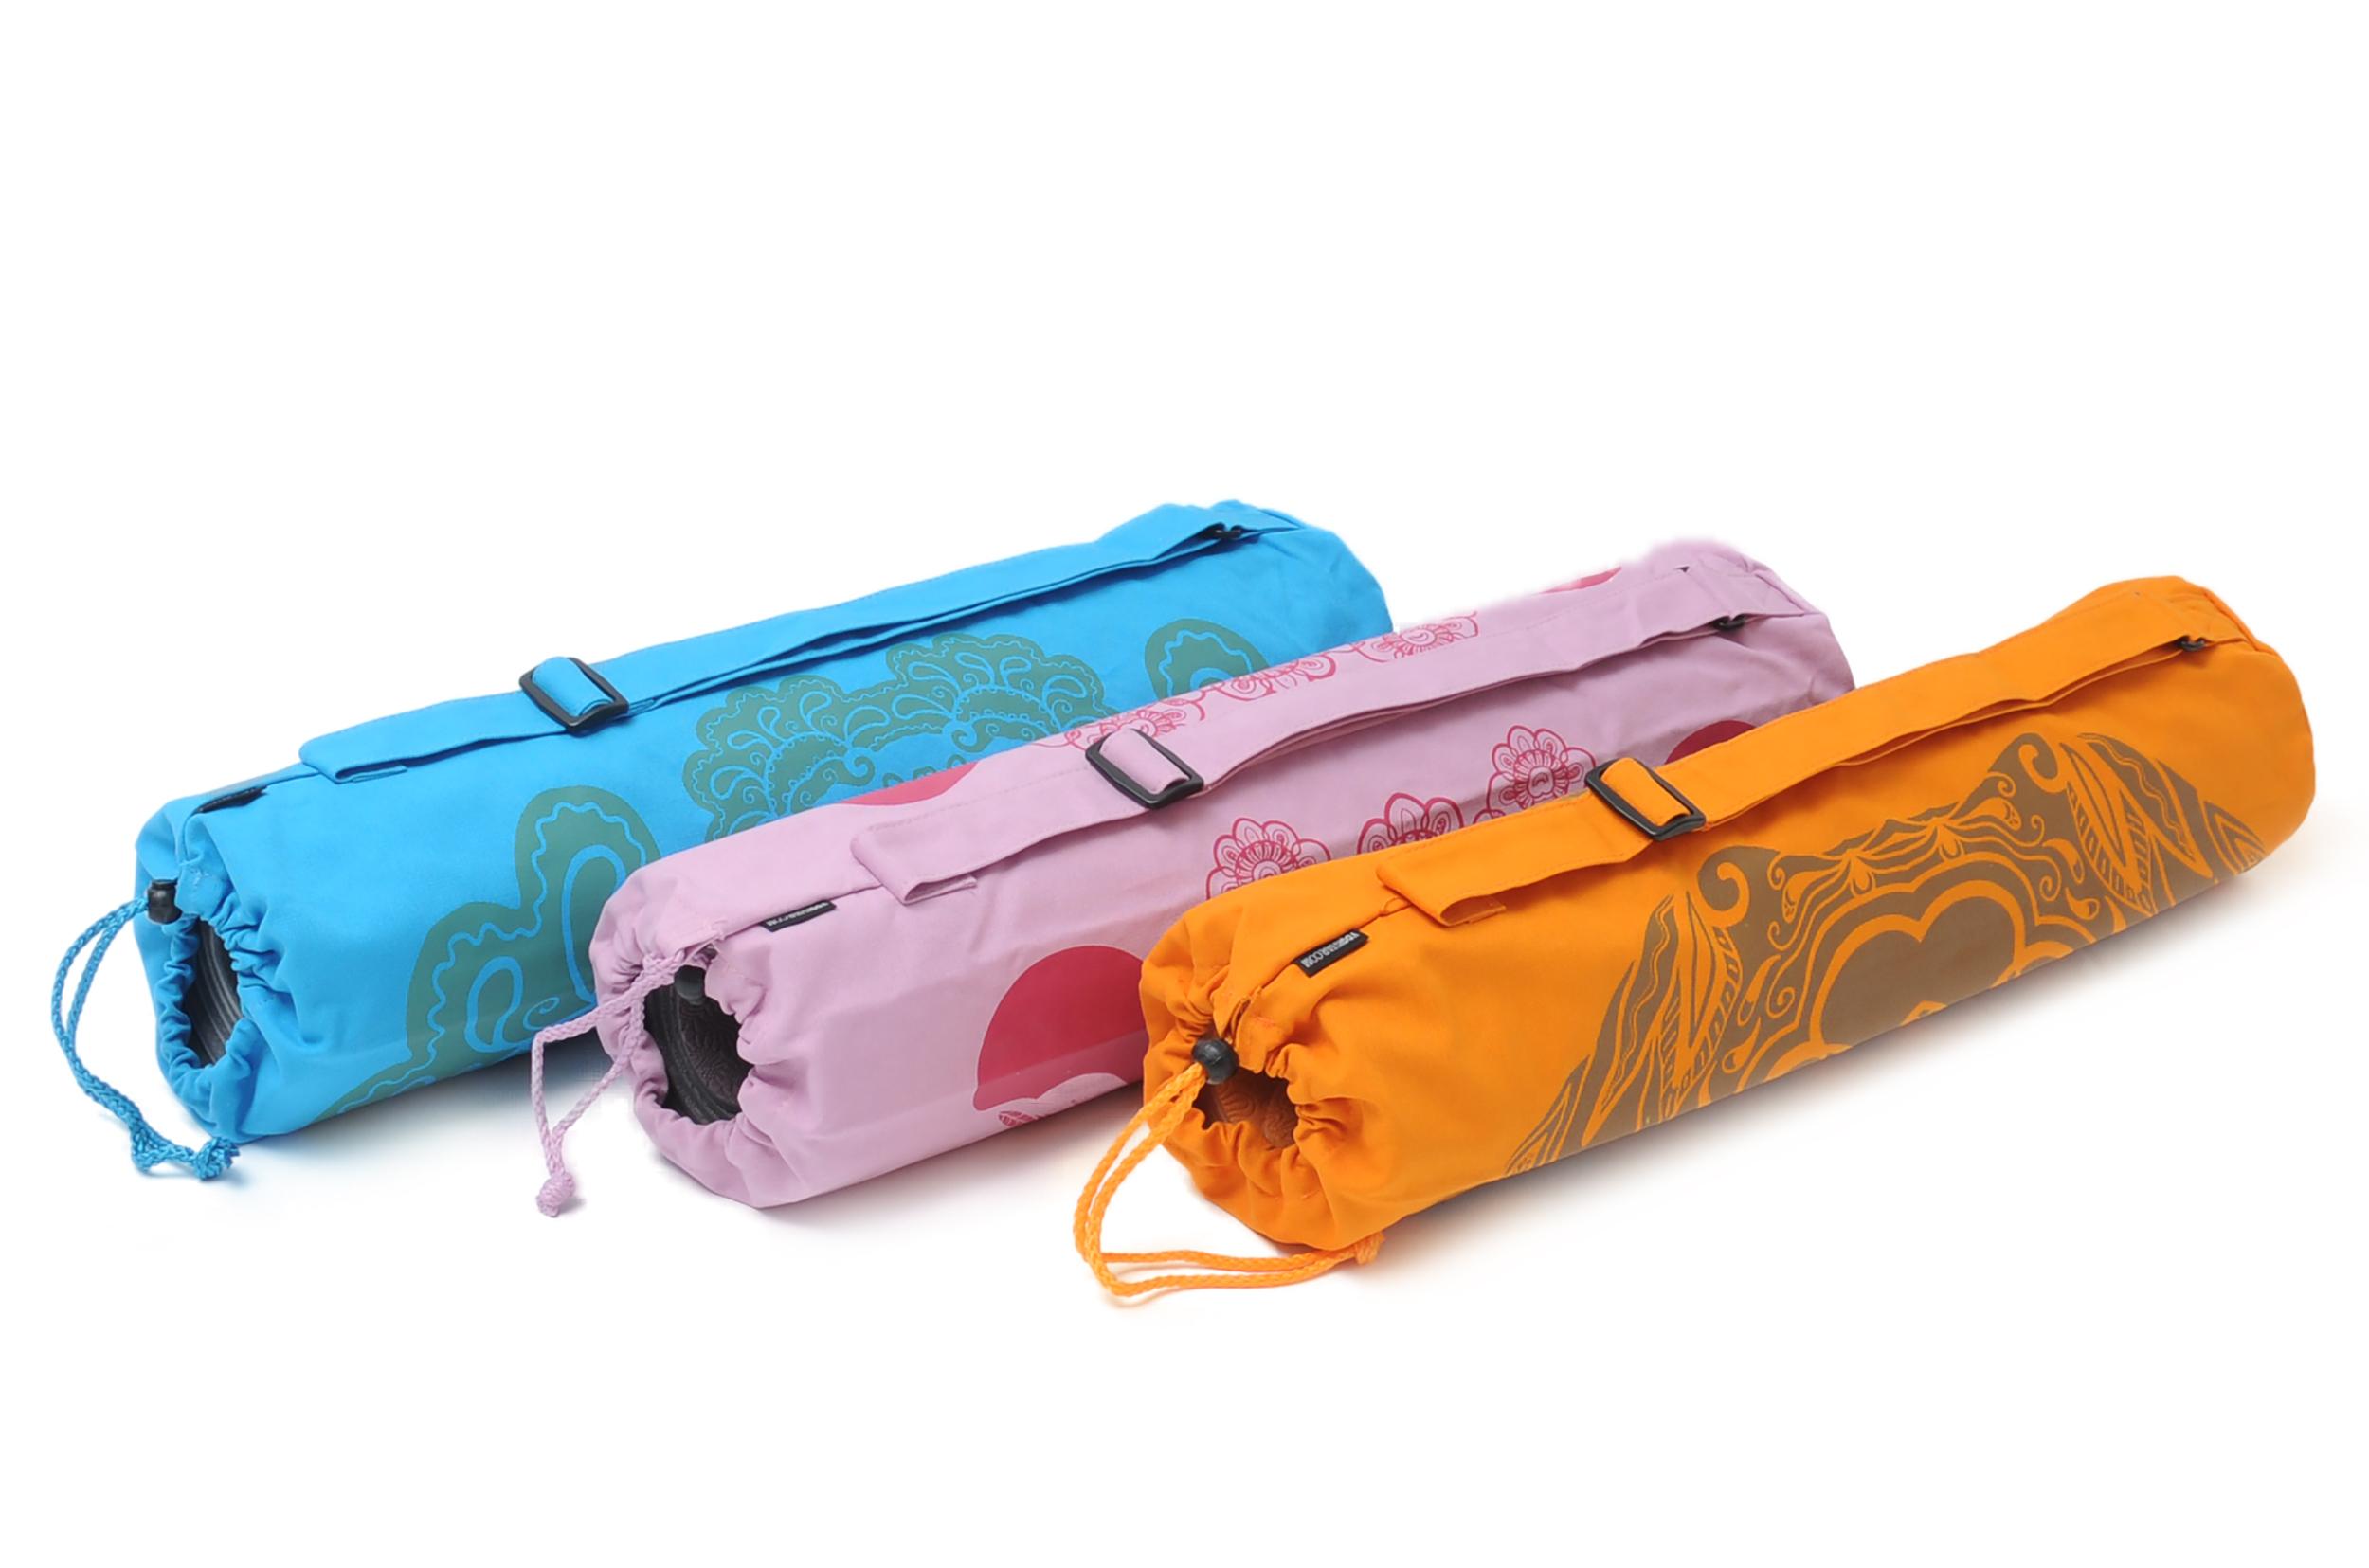 Yogatasche yogibag® basic - cotton - art collection - 65 cm